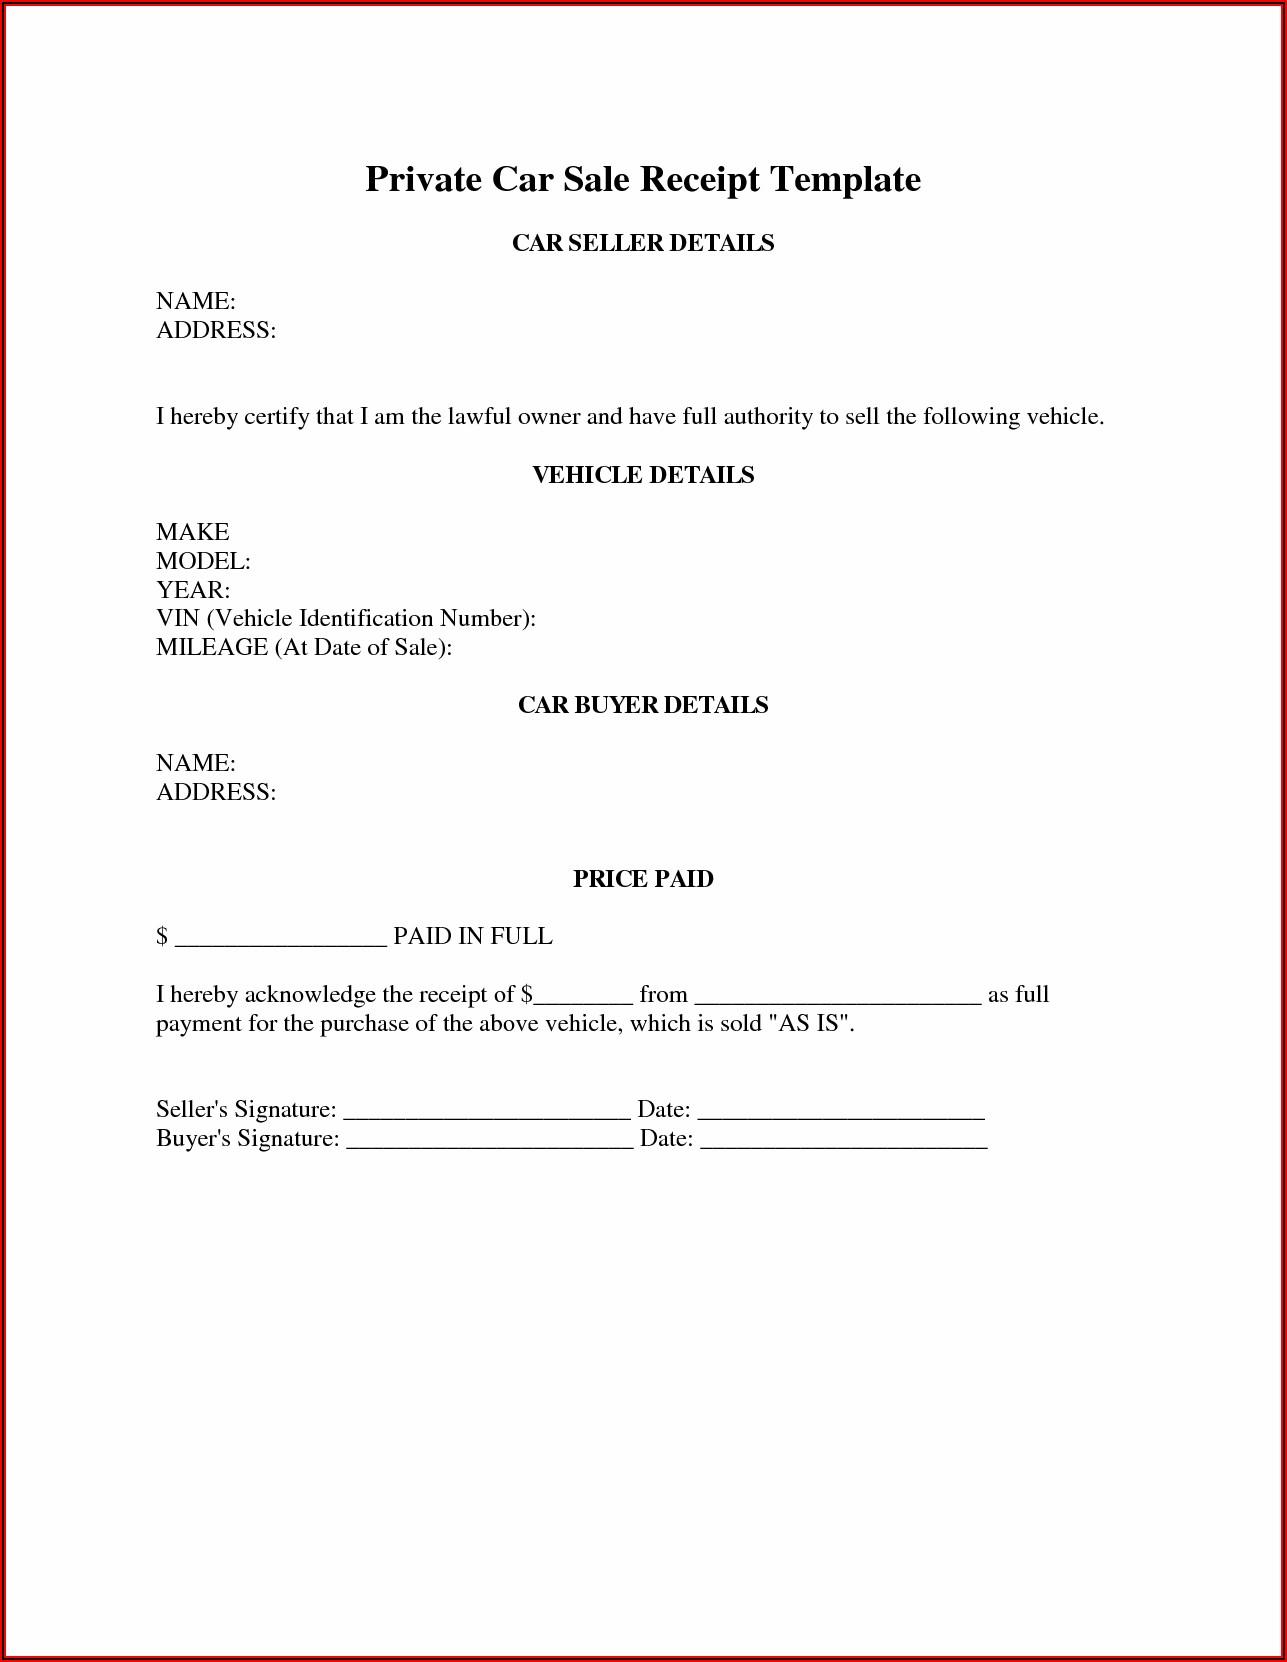 Vehicle Sale Receipt Template Qld